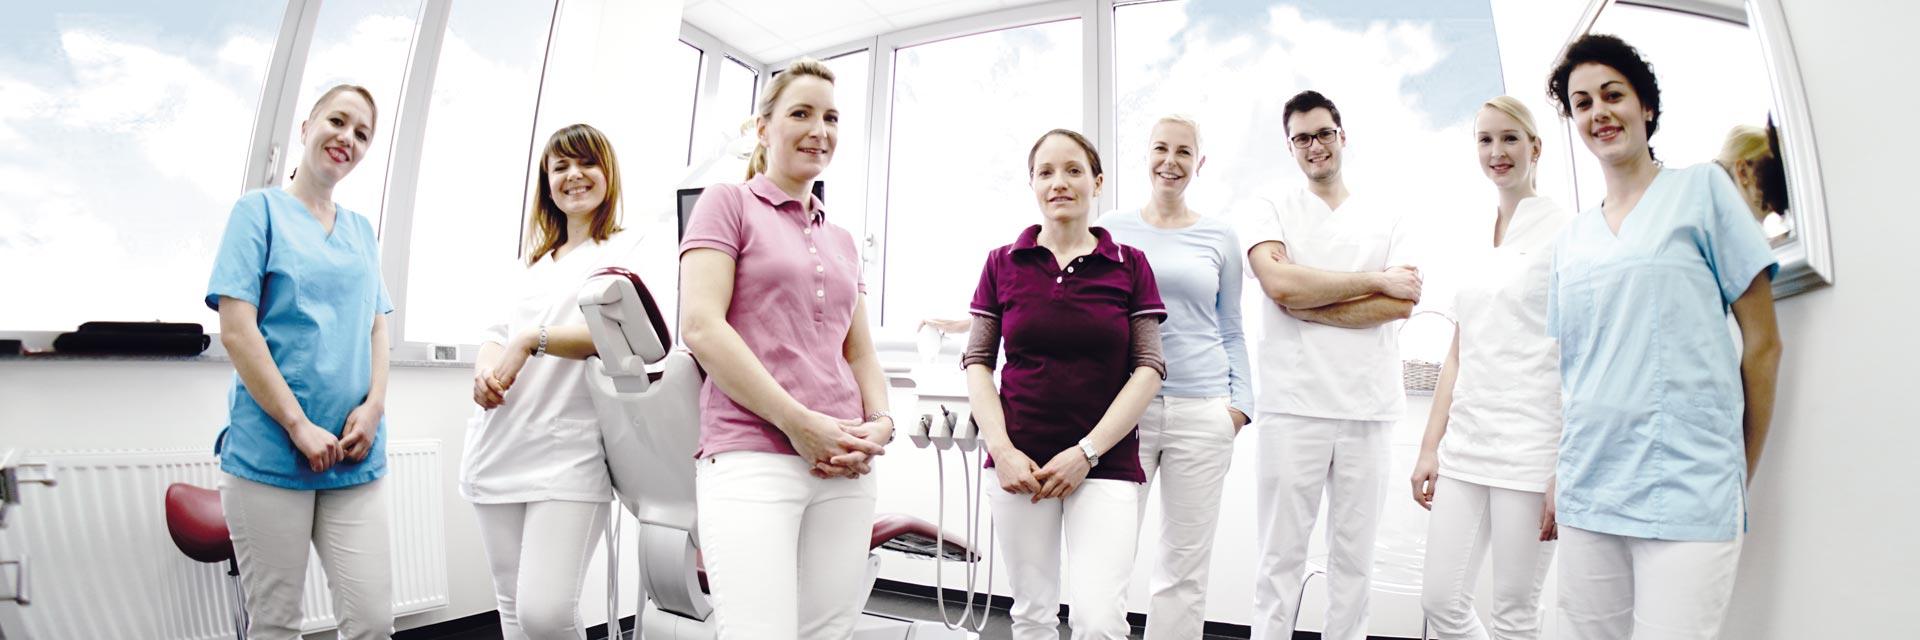 dentics-team-ludwigsburg-neu